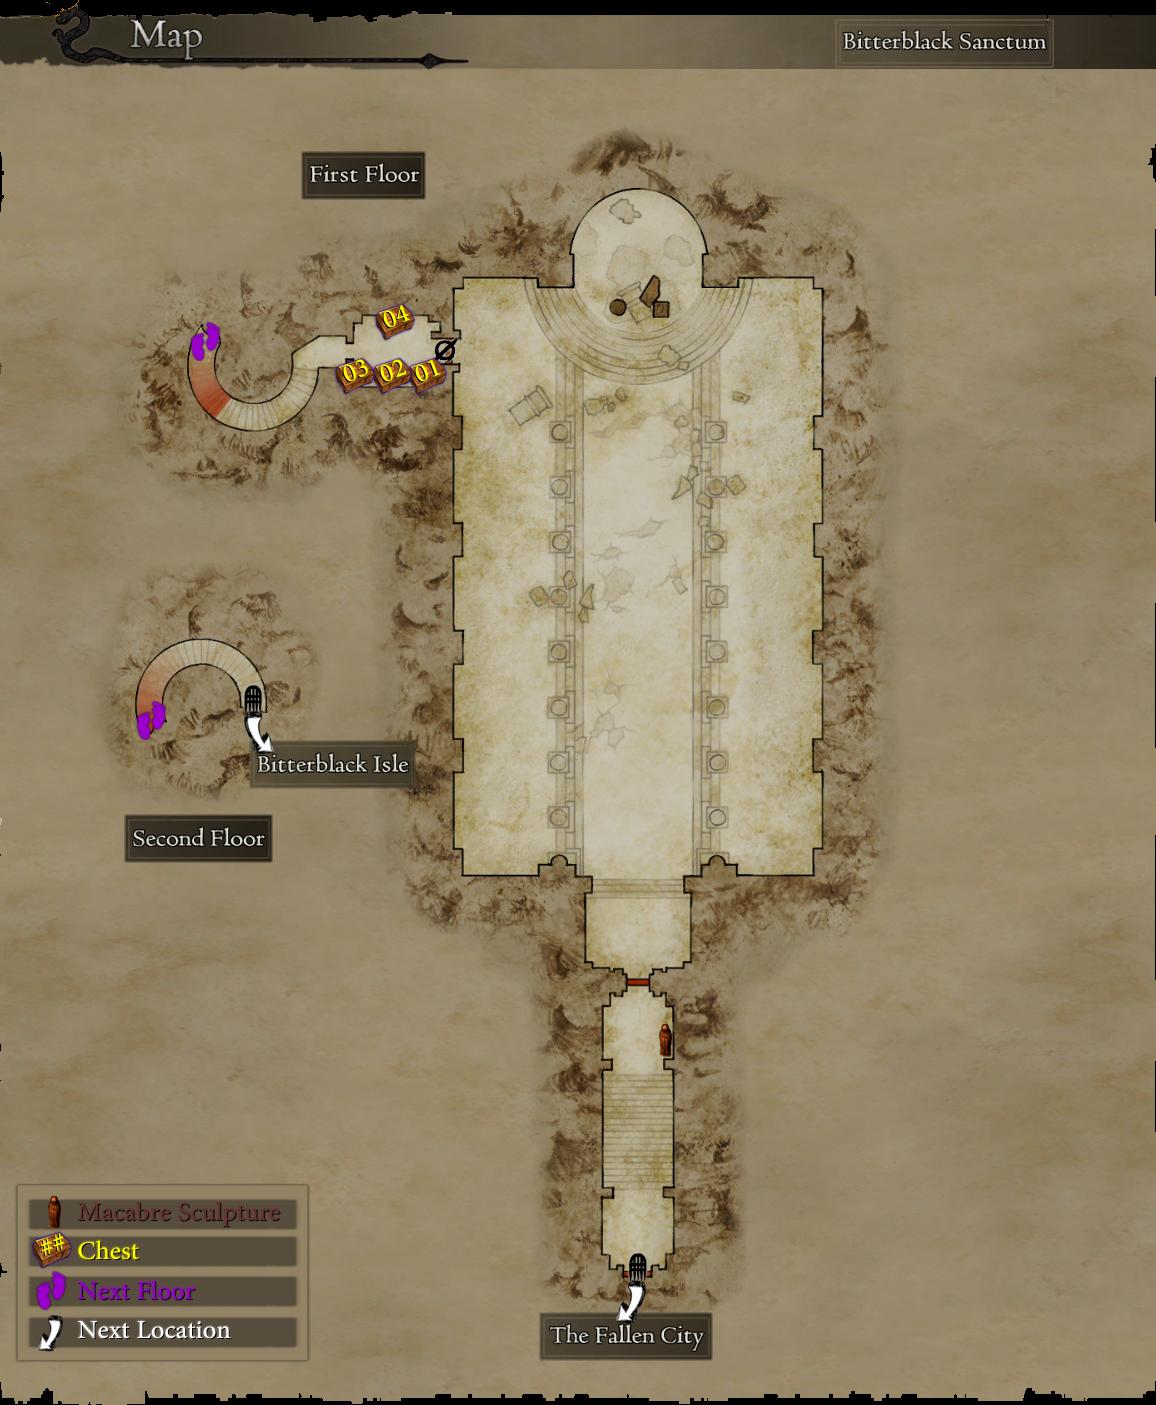 Farming Bitterblack level 3 armor, weapons and gear using Godsbane on